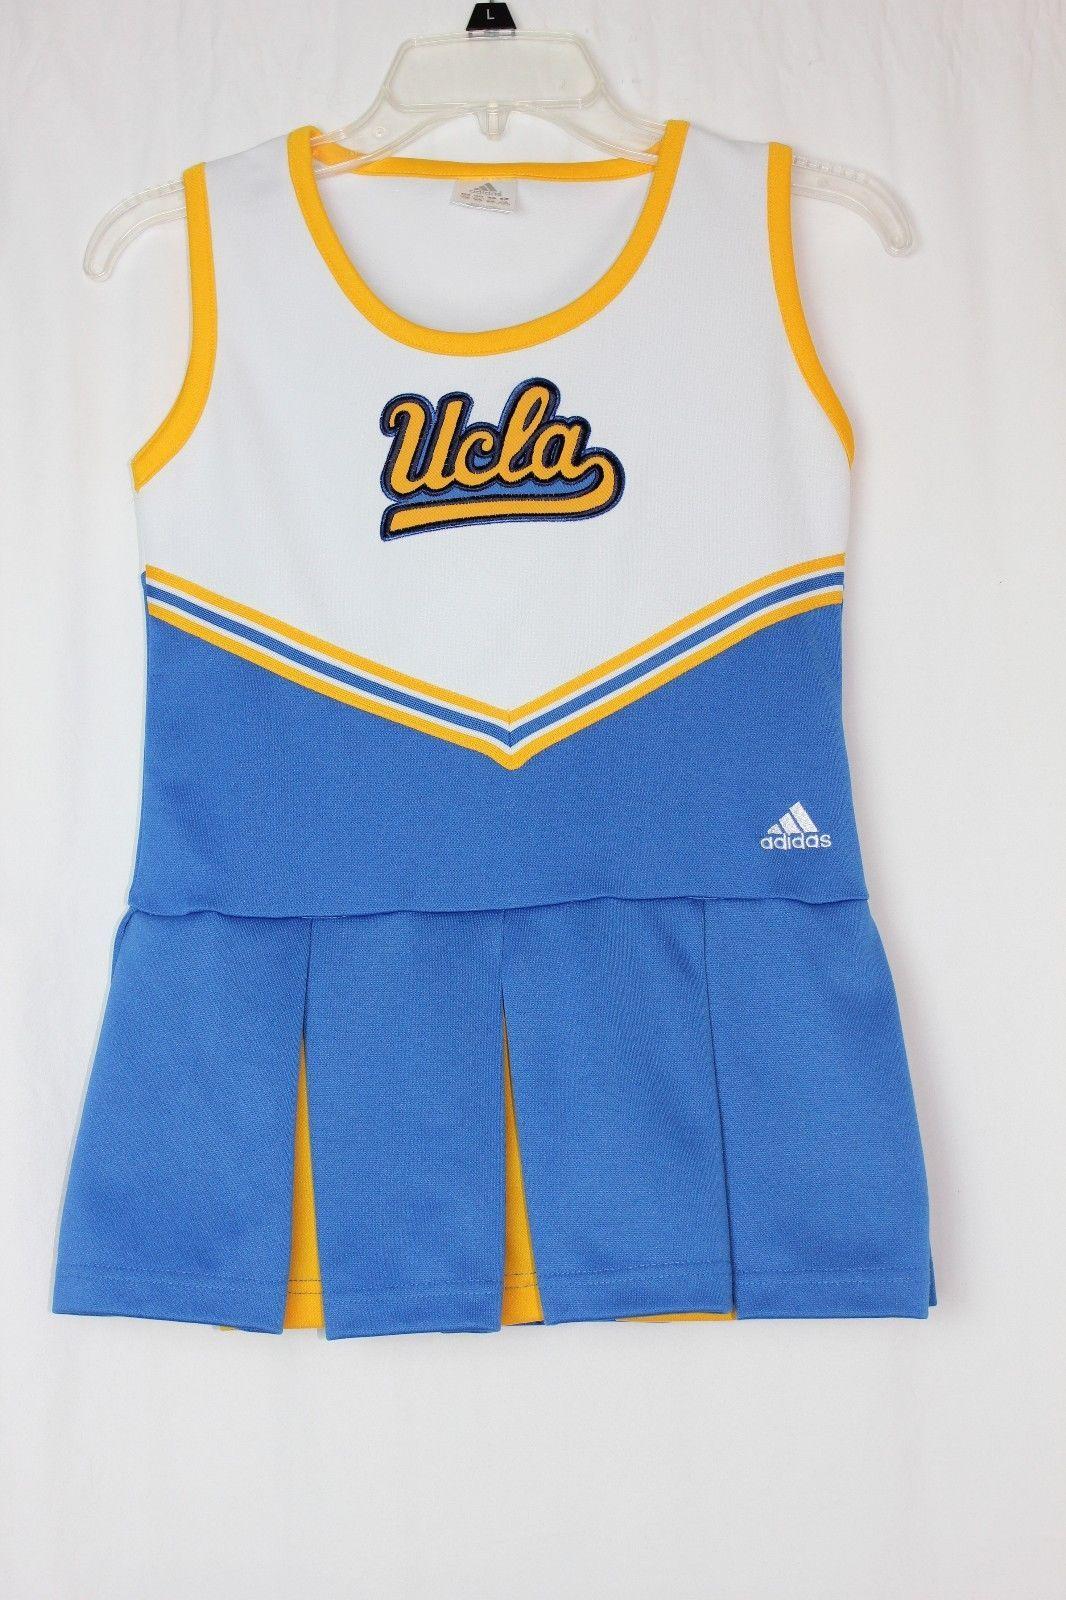 b321cac9ab8 Adidas UCLA Bruins Cheerleader Uniform Costume Dress Youth Medium 10 ...